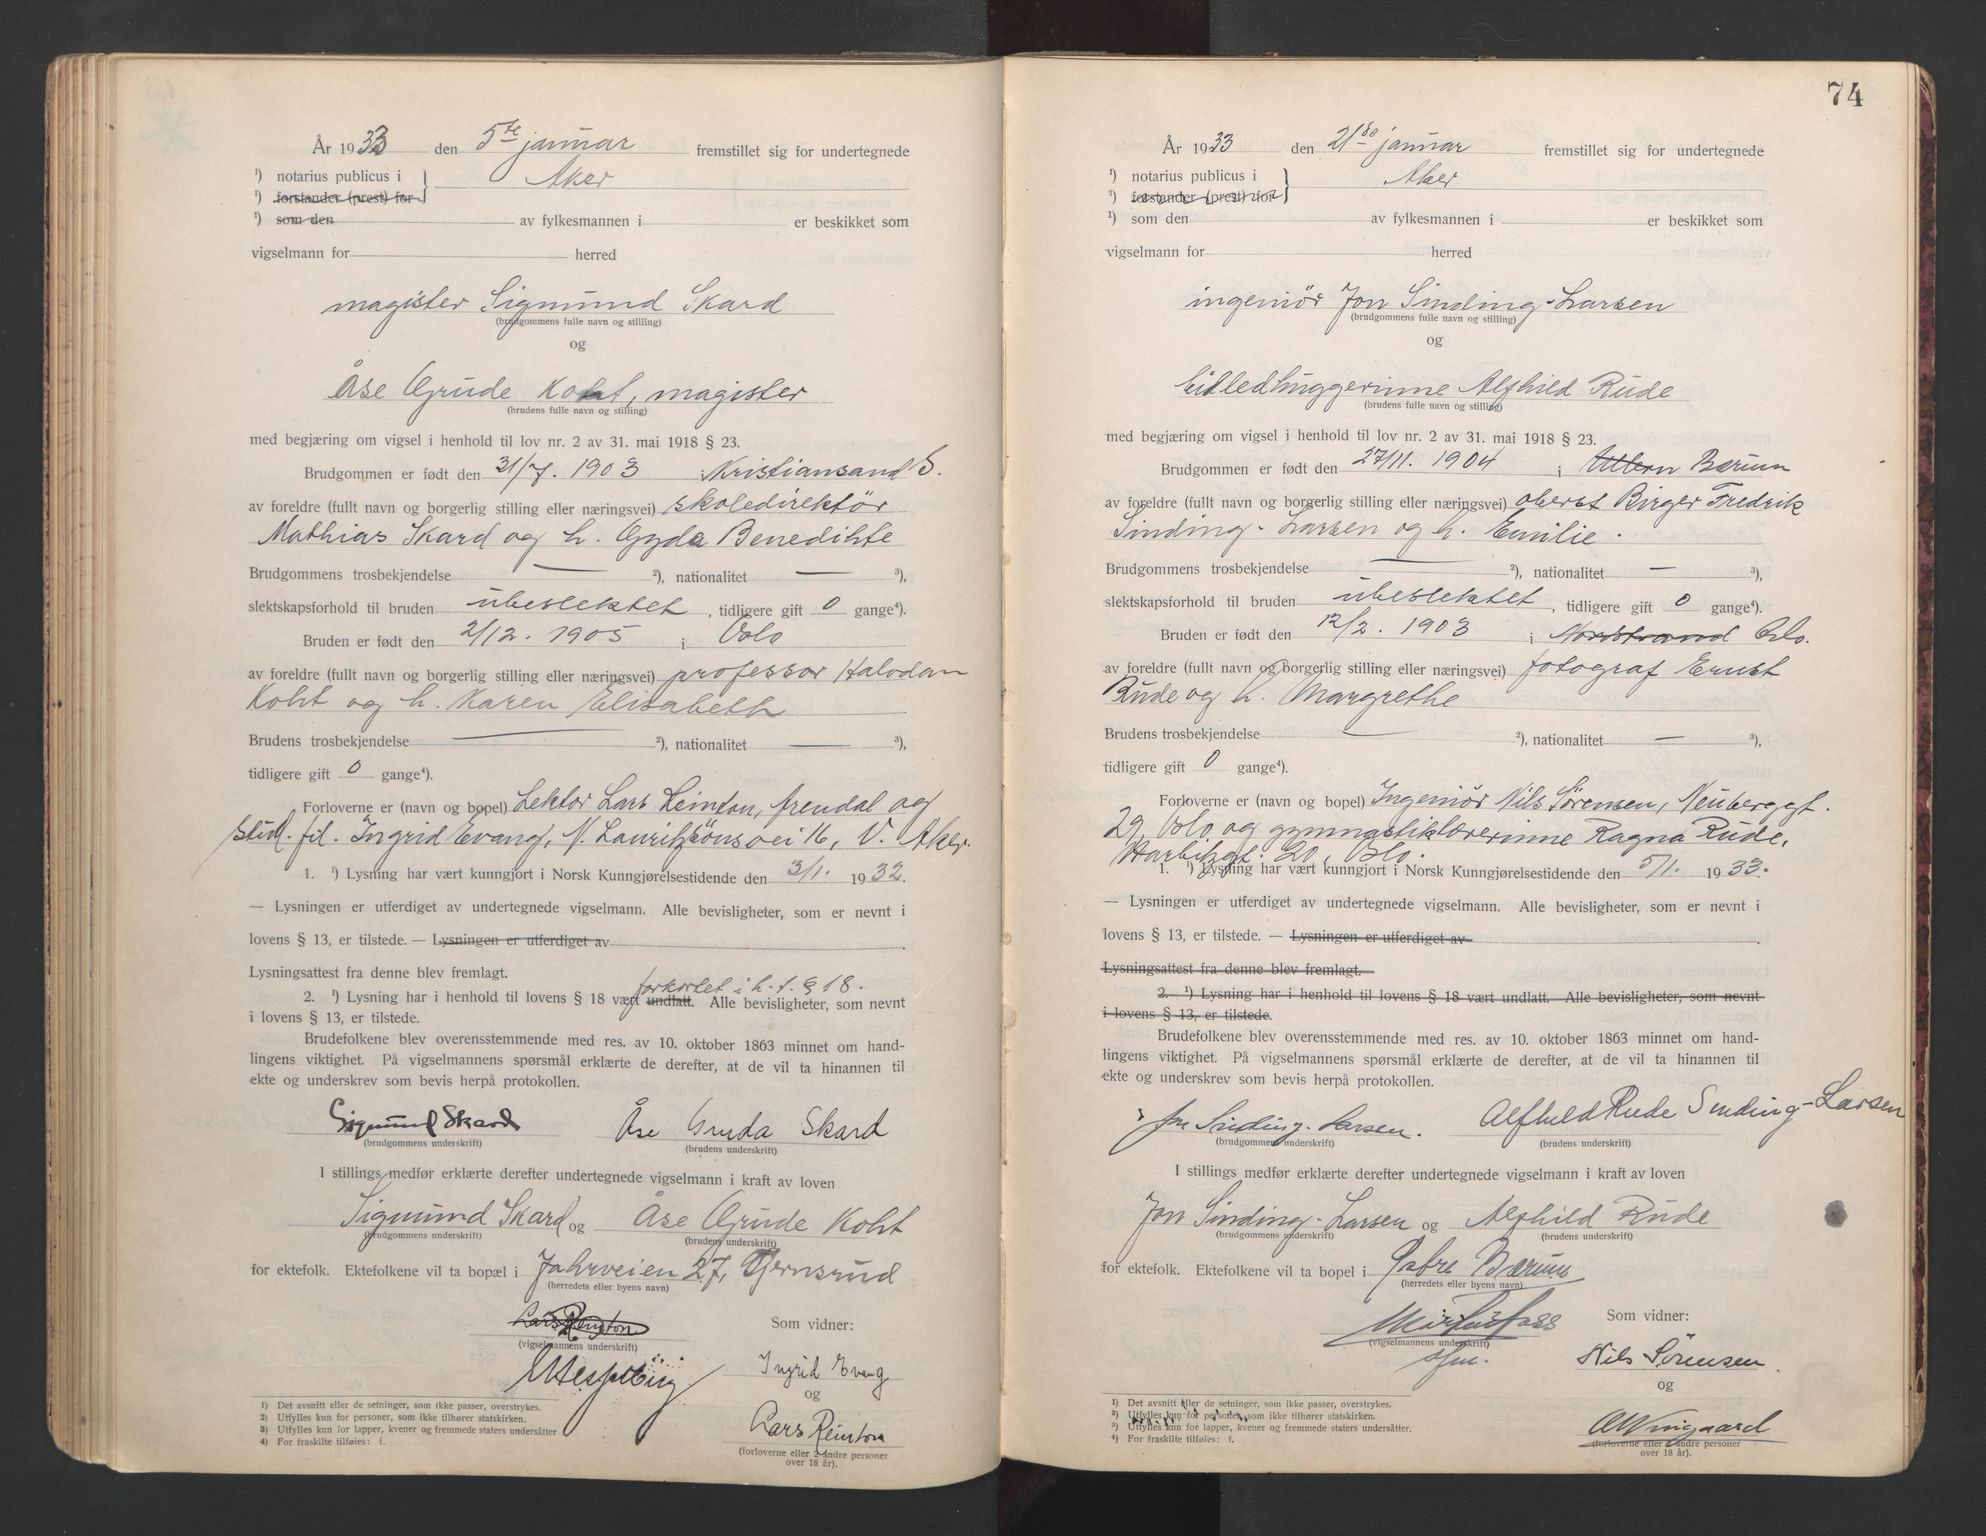 SAO, Aker sorenskriveri, L/Lc/Lcb/L0006: Vigselprotokoll, 1931-1933, s. 74